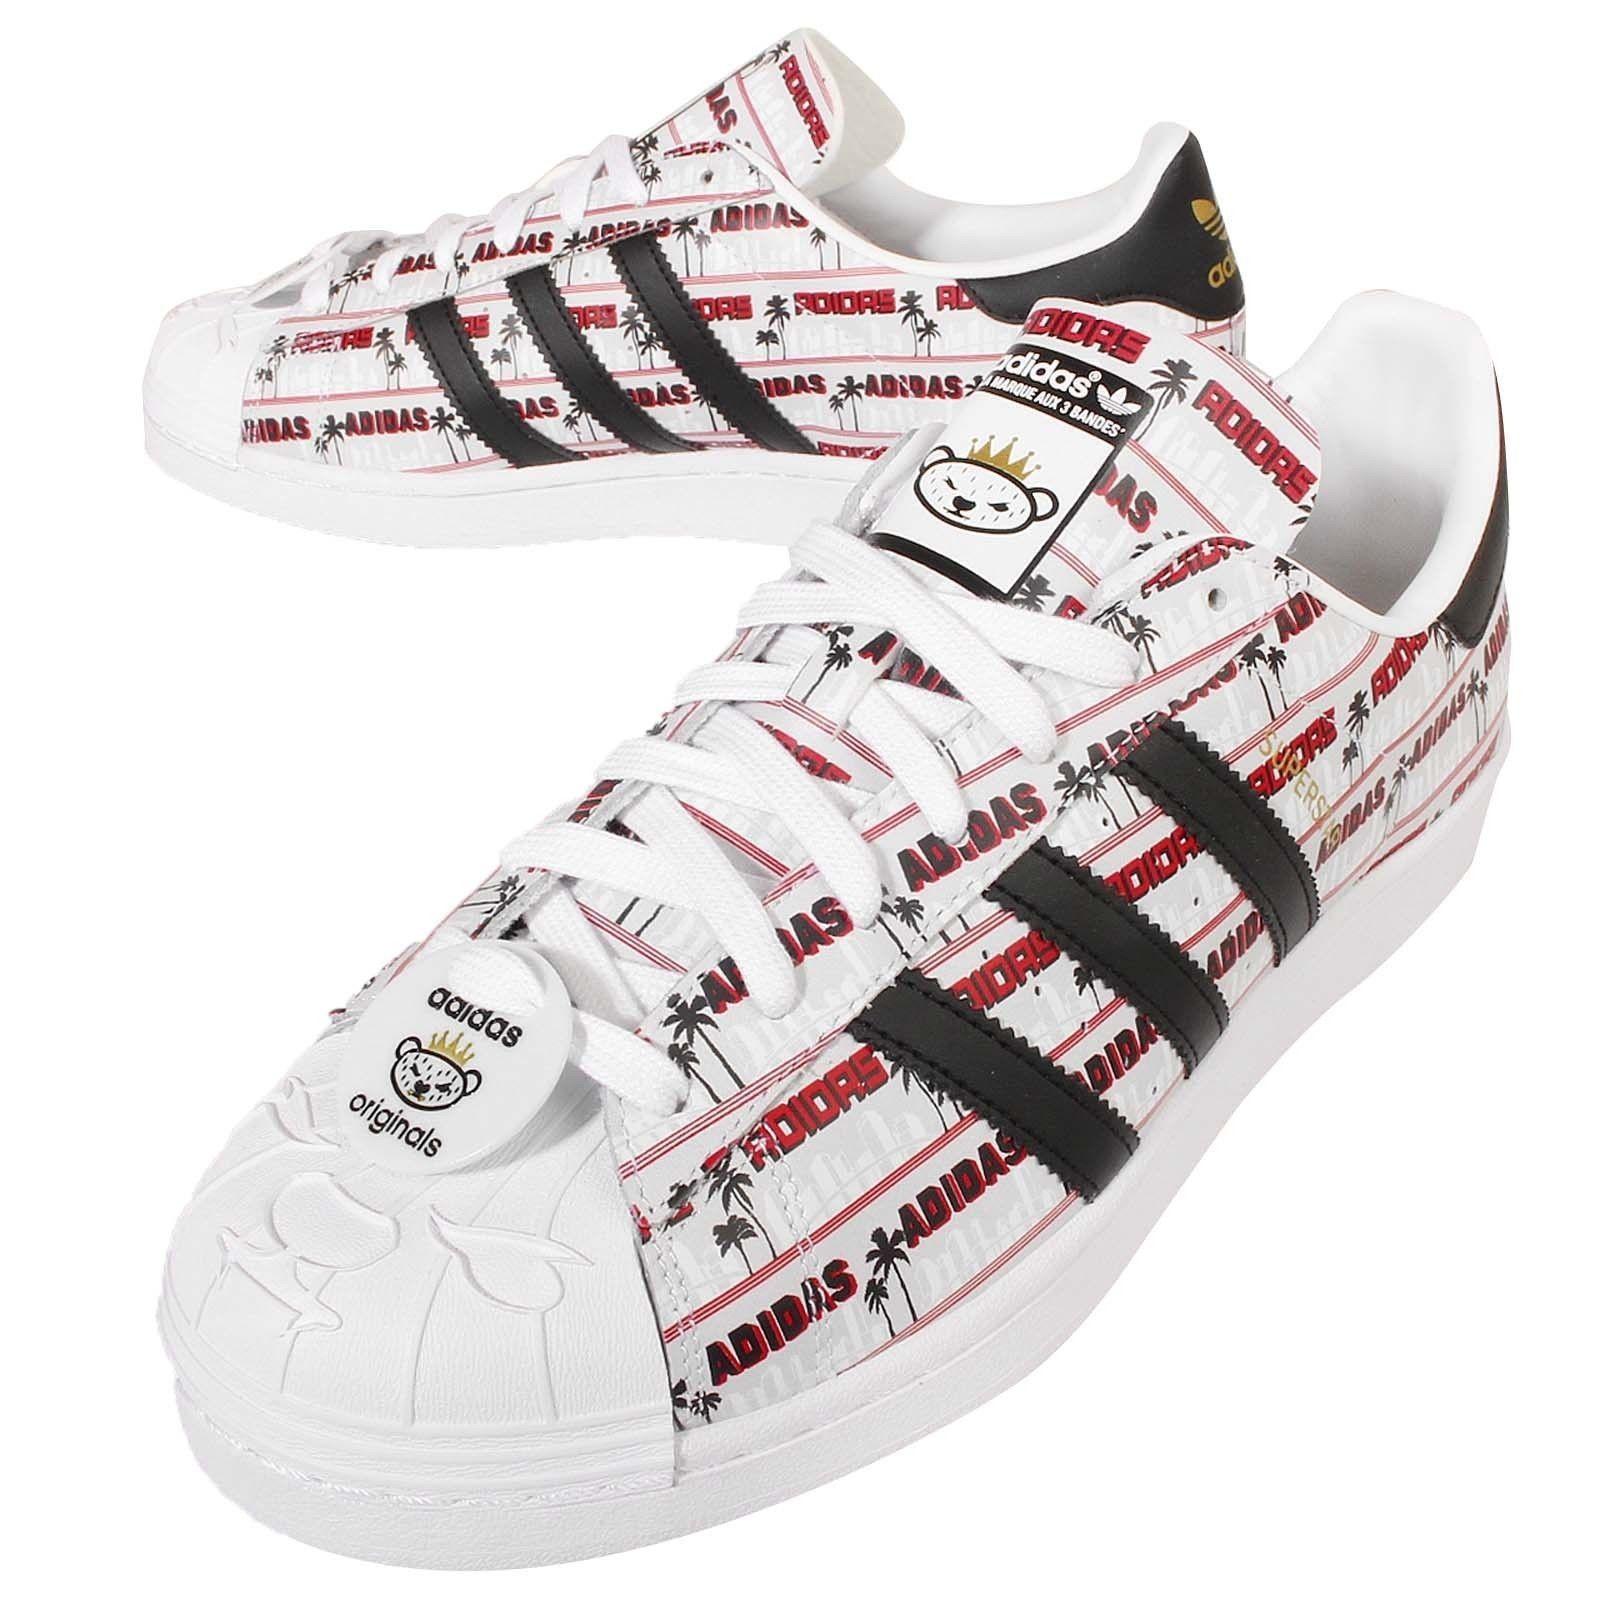 2016 Adidas Superstar Klassisch Originals NIGO Bearfoot Herren Sport Schuhe  NIGO… NigoAdidas SuperstarAdidas OriginalsSneakerHerrinClassicRedSlippers  ...